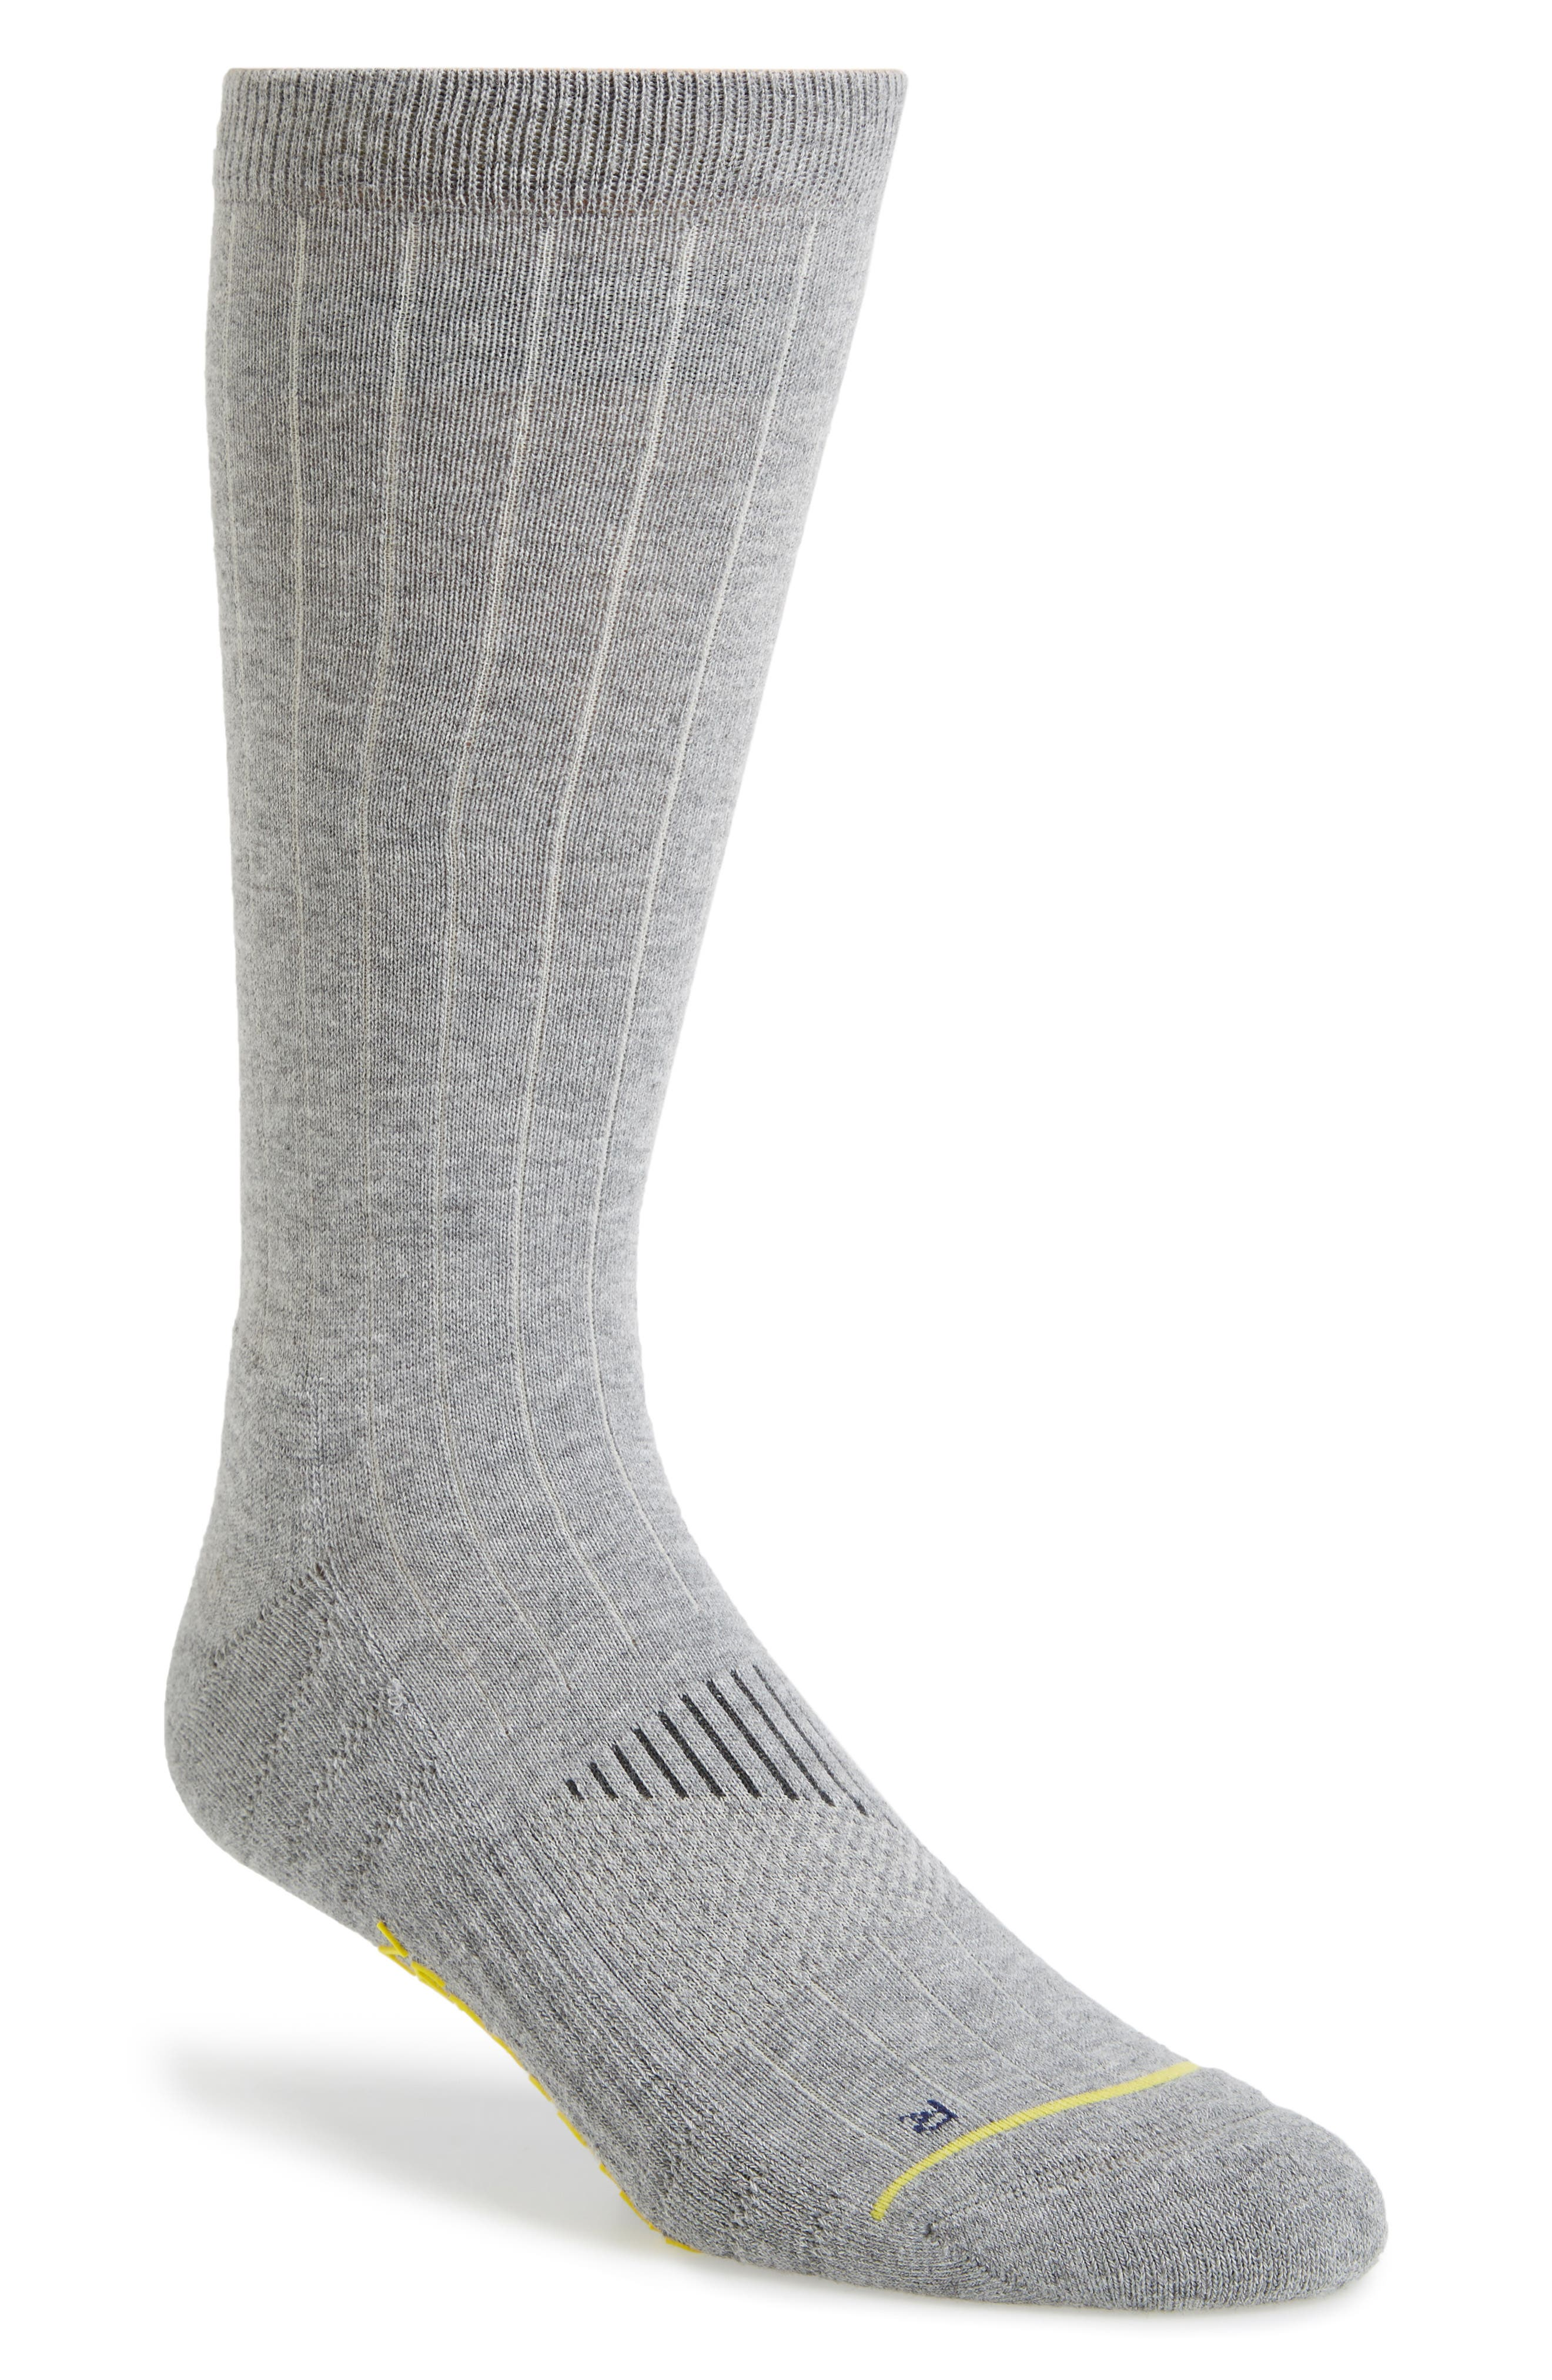 ZeroGrand Ribbed Crew Socks,                         Main,                         color, Grey Heather